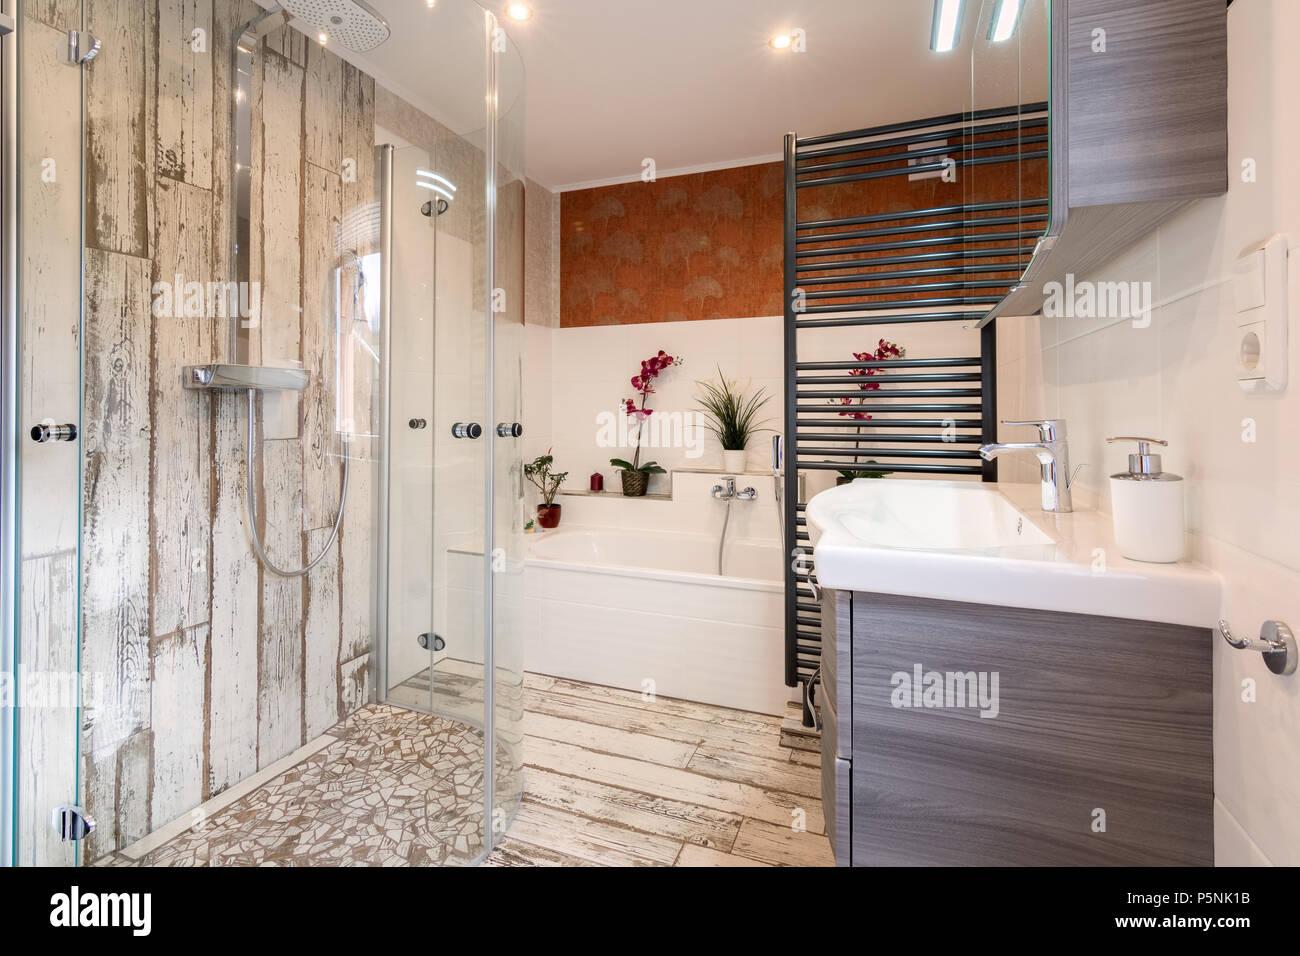 Bagno moderno in stile vintage foto immagine stock